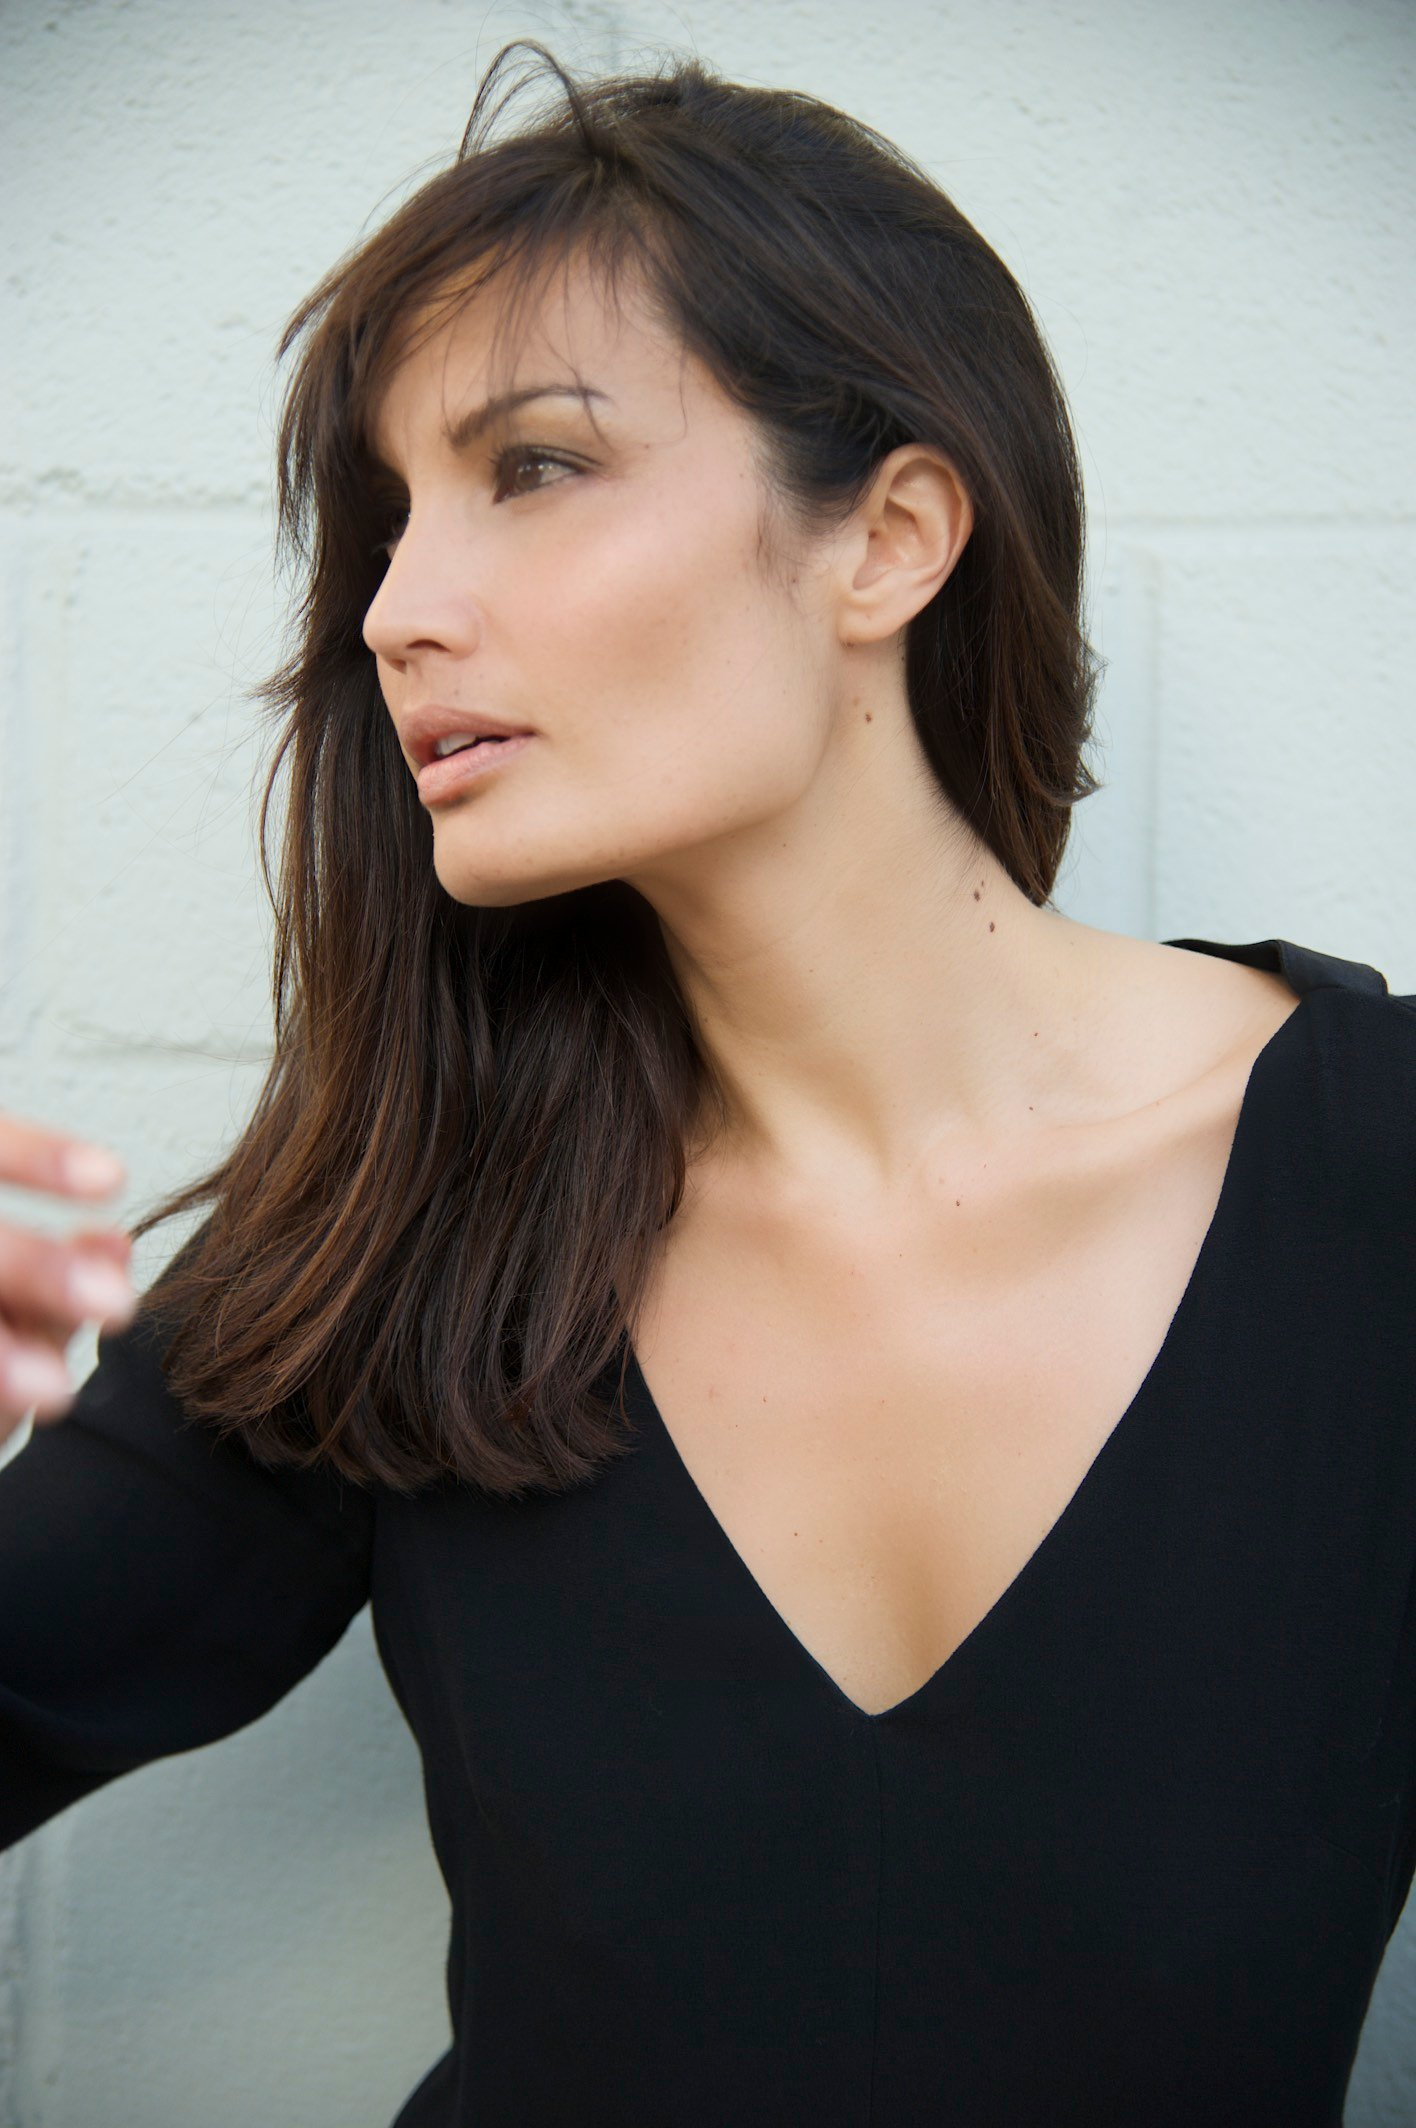 Model Musician ALANNA VICENTE